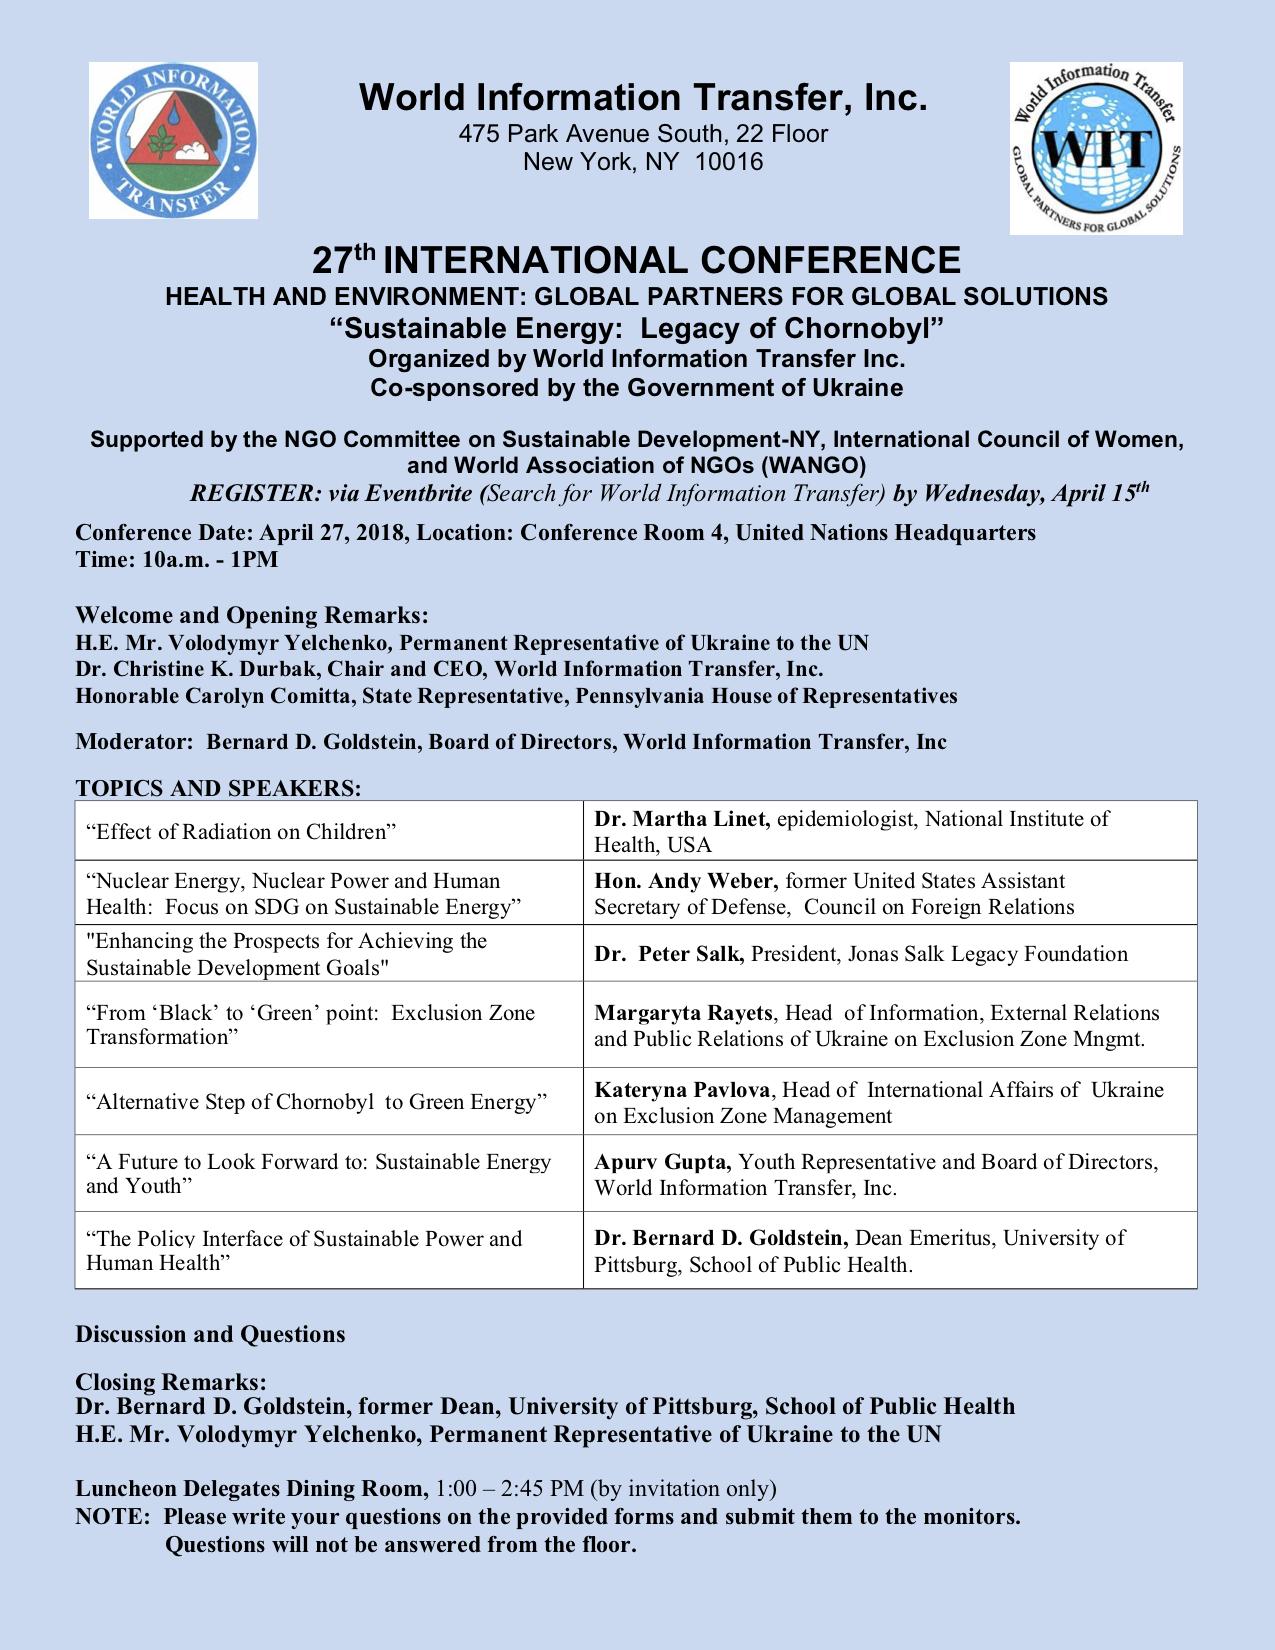 NGOCSD-NY WIT with ICW & WANGO Meeting 4-27-18.png